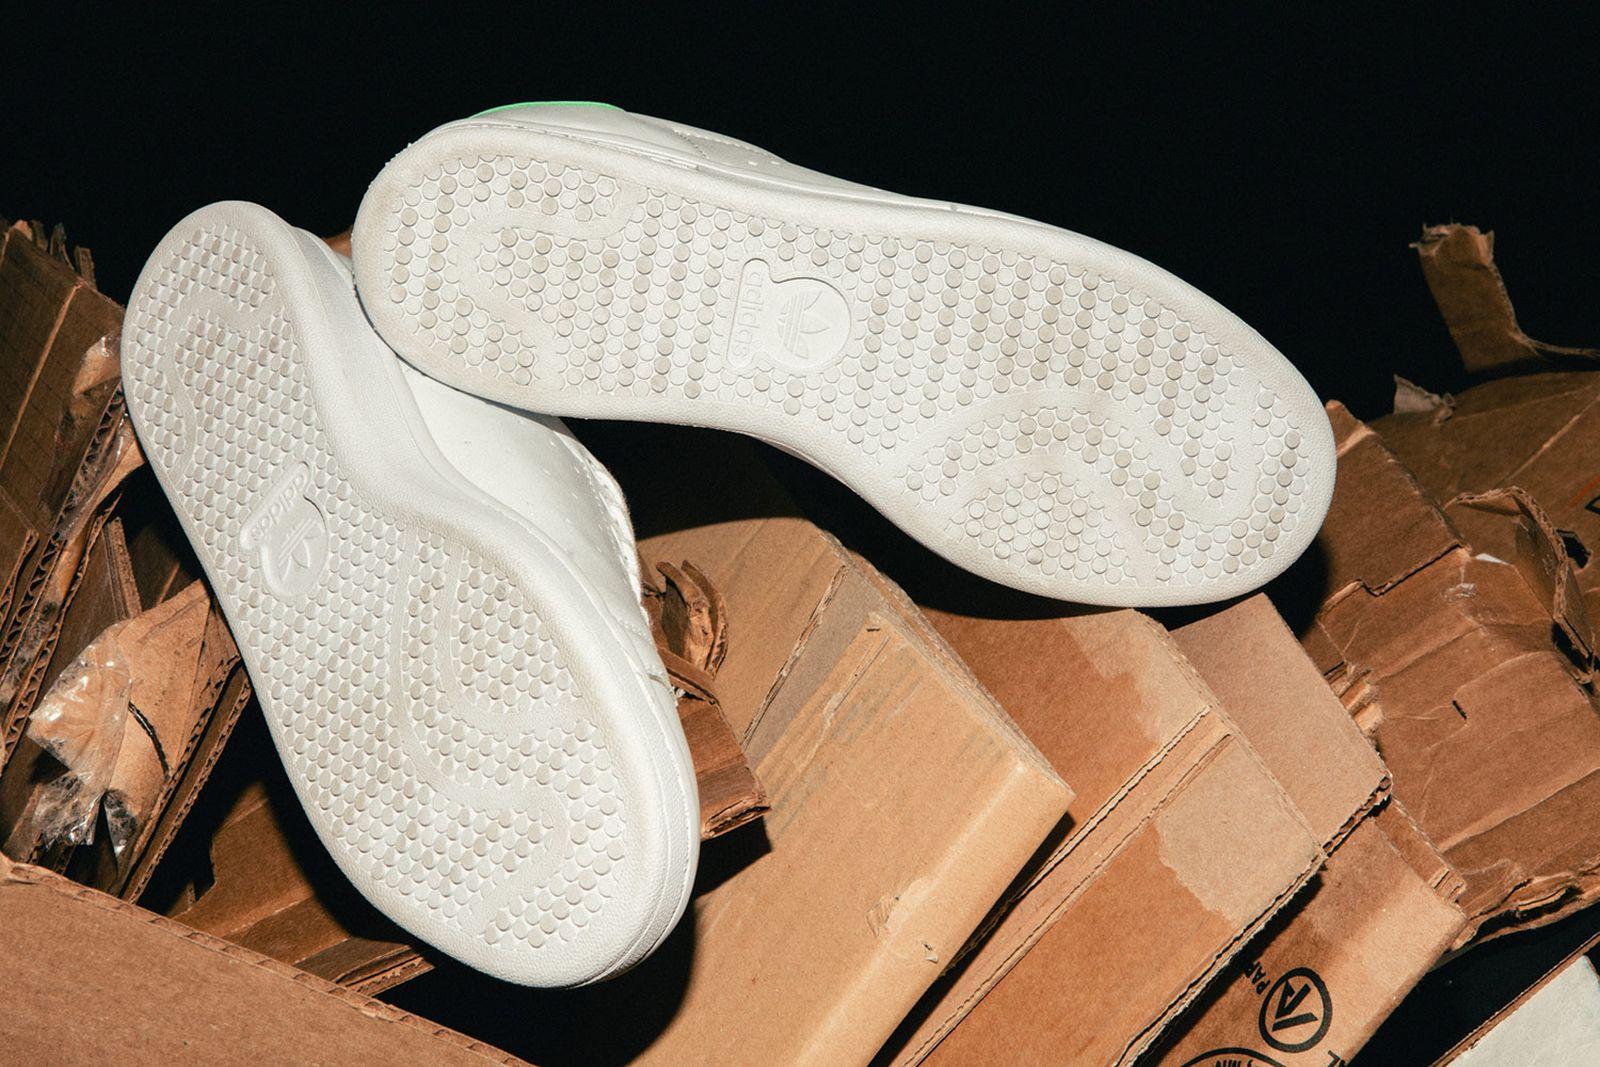 Legit-Check-Fake-Sneakers-Highsnobiety-10